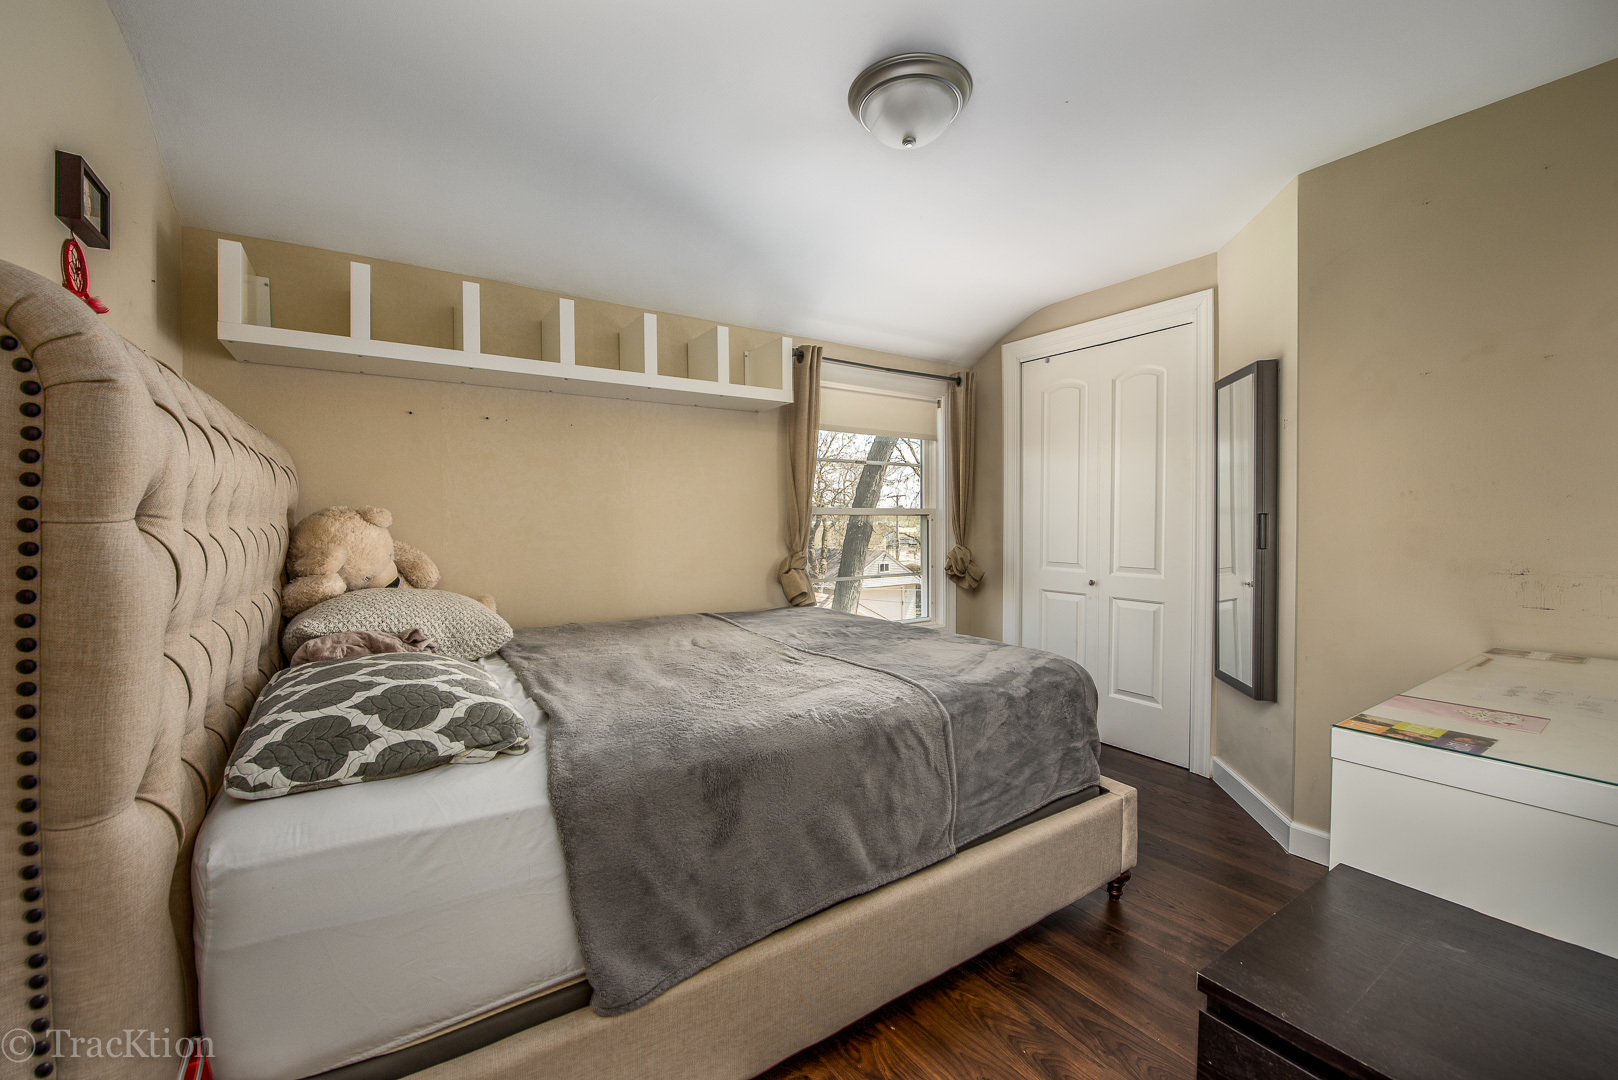 439 North Princeton, Villa Park, Illinois, 60181